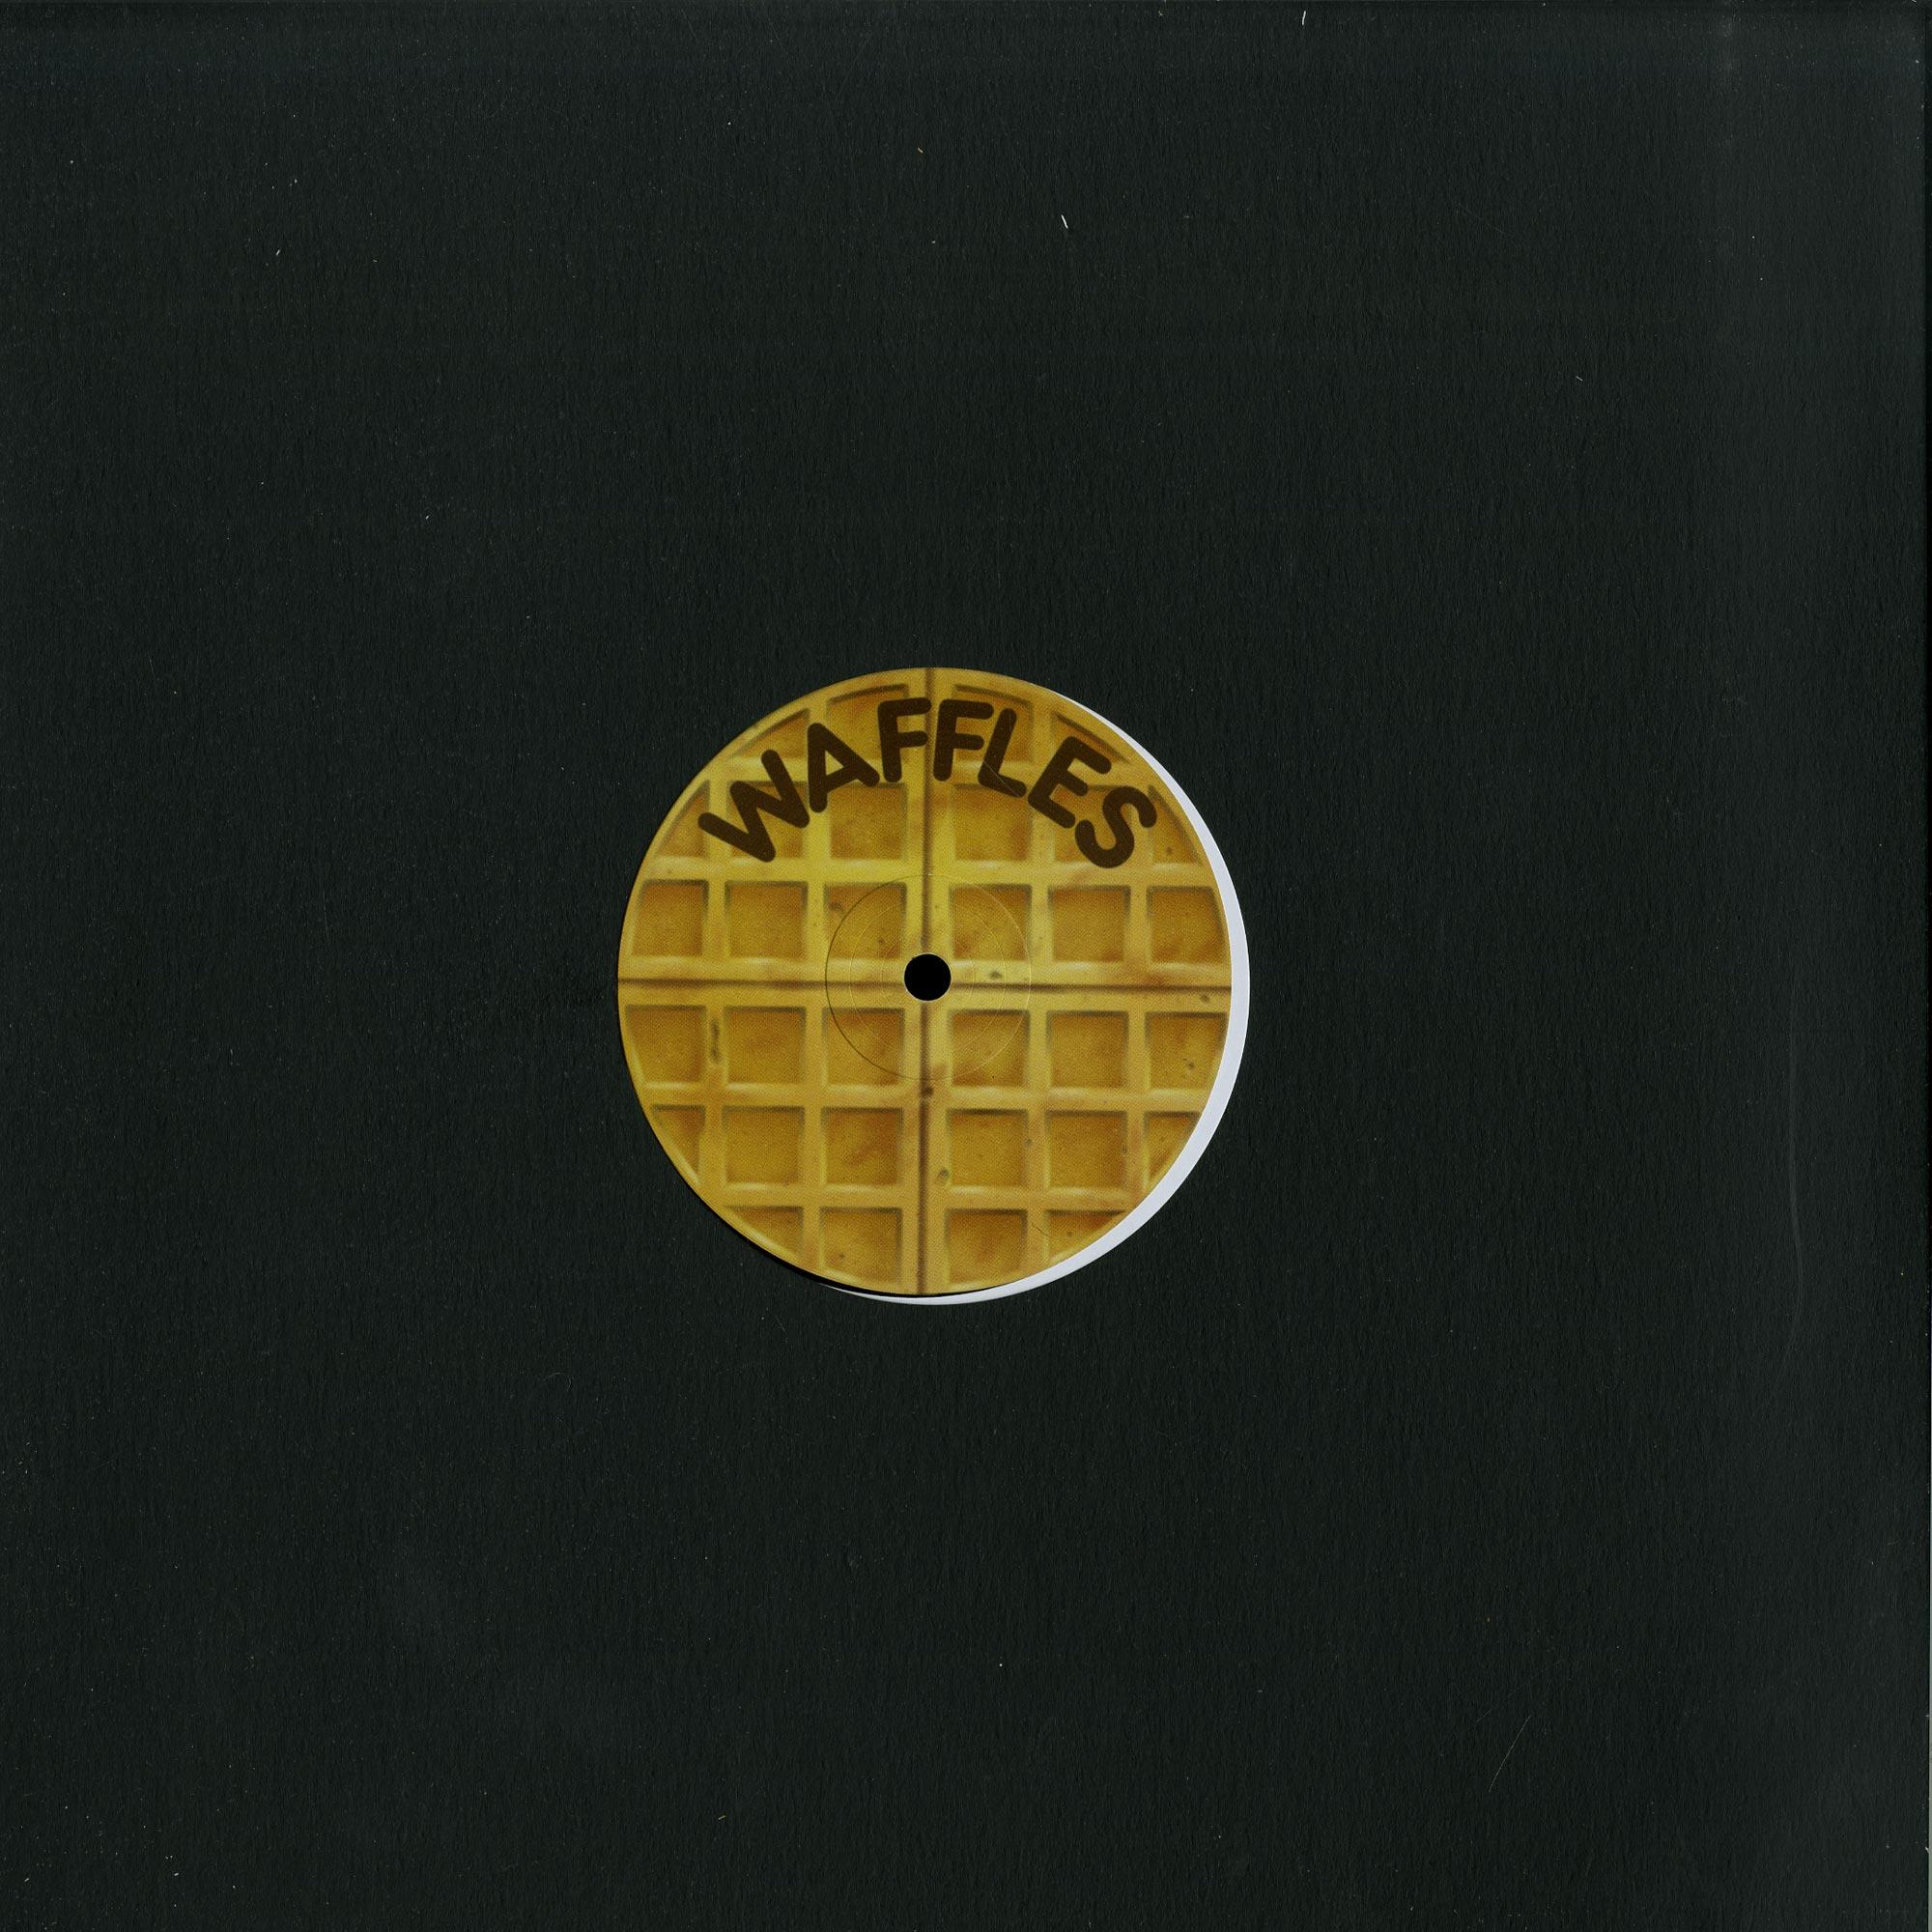 Waffles - WAFFLES005